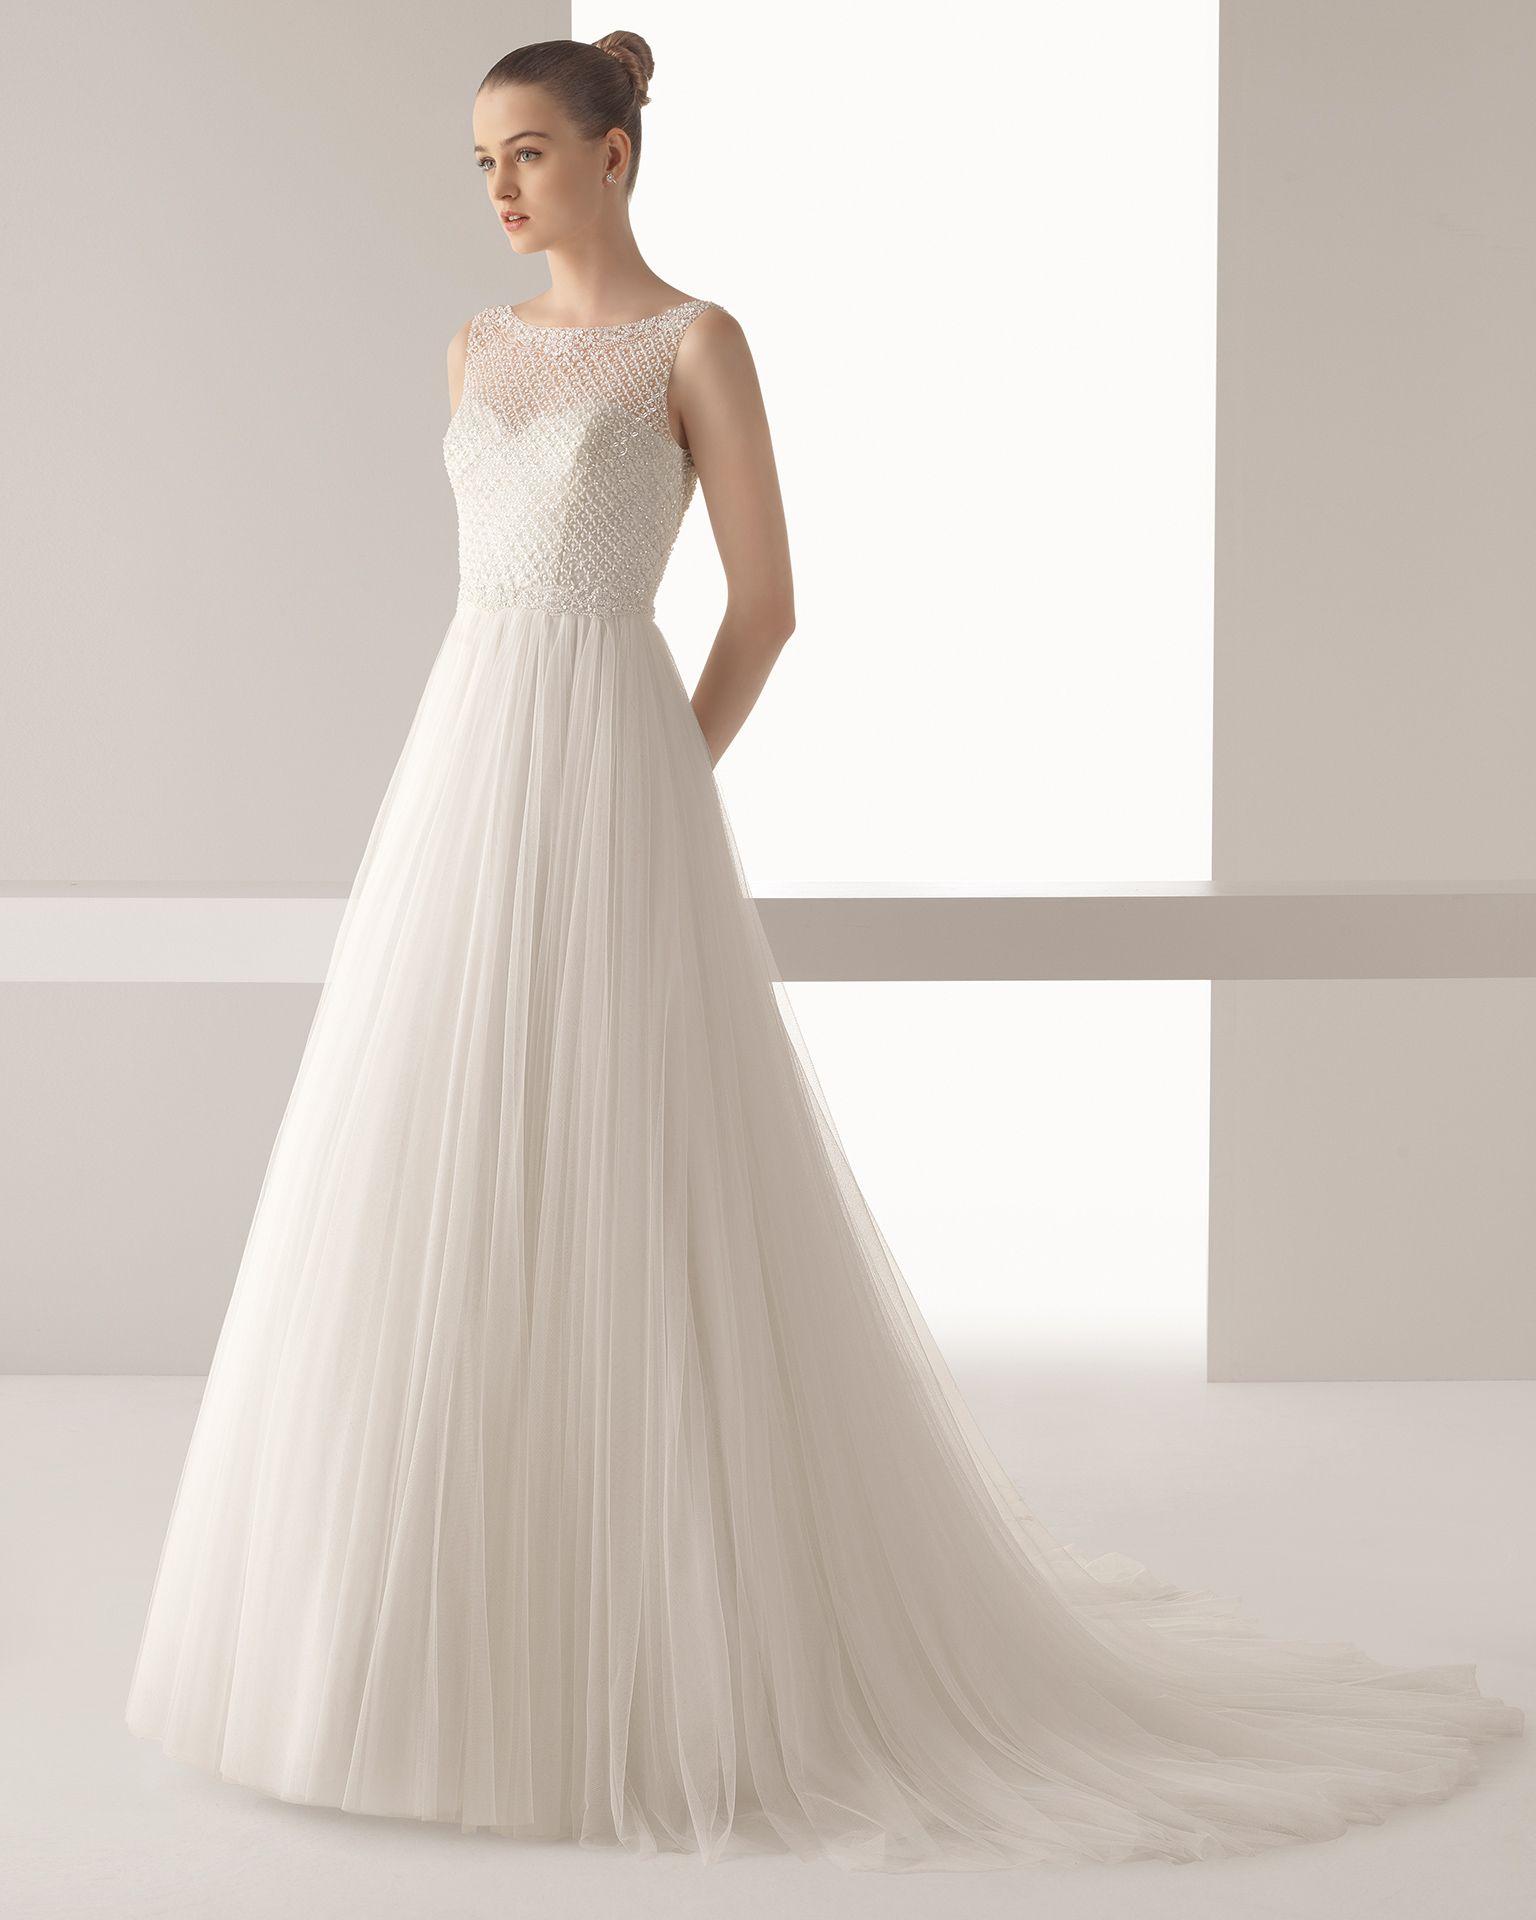 See Meghan Mccain S Gorgeous Wedding Dress: Soft By Rosa Clara Wedding Dresses 2015